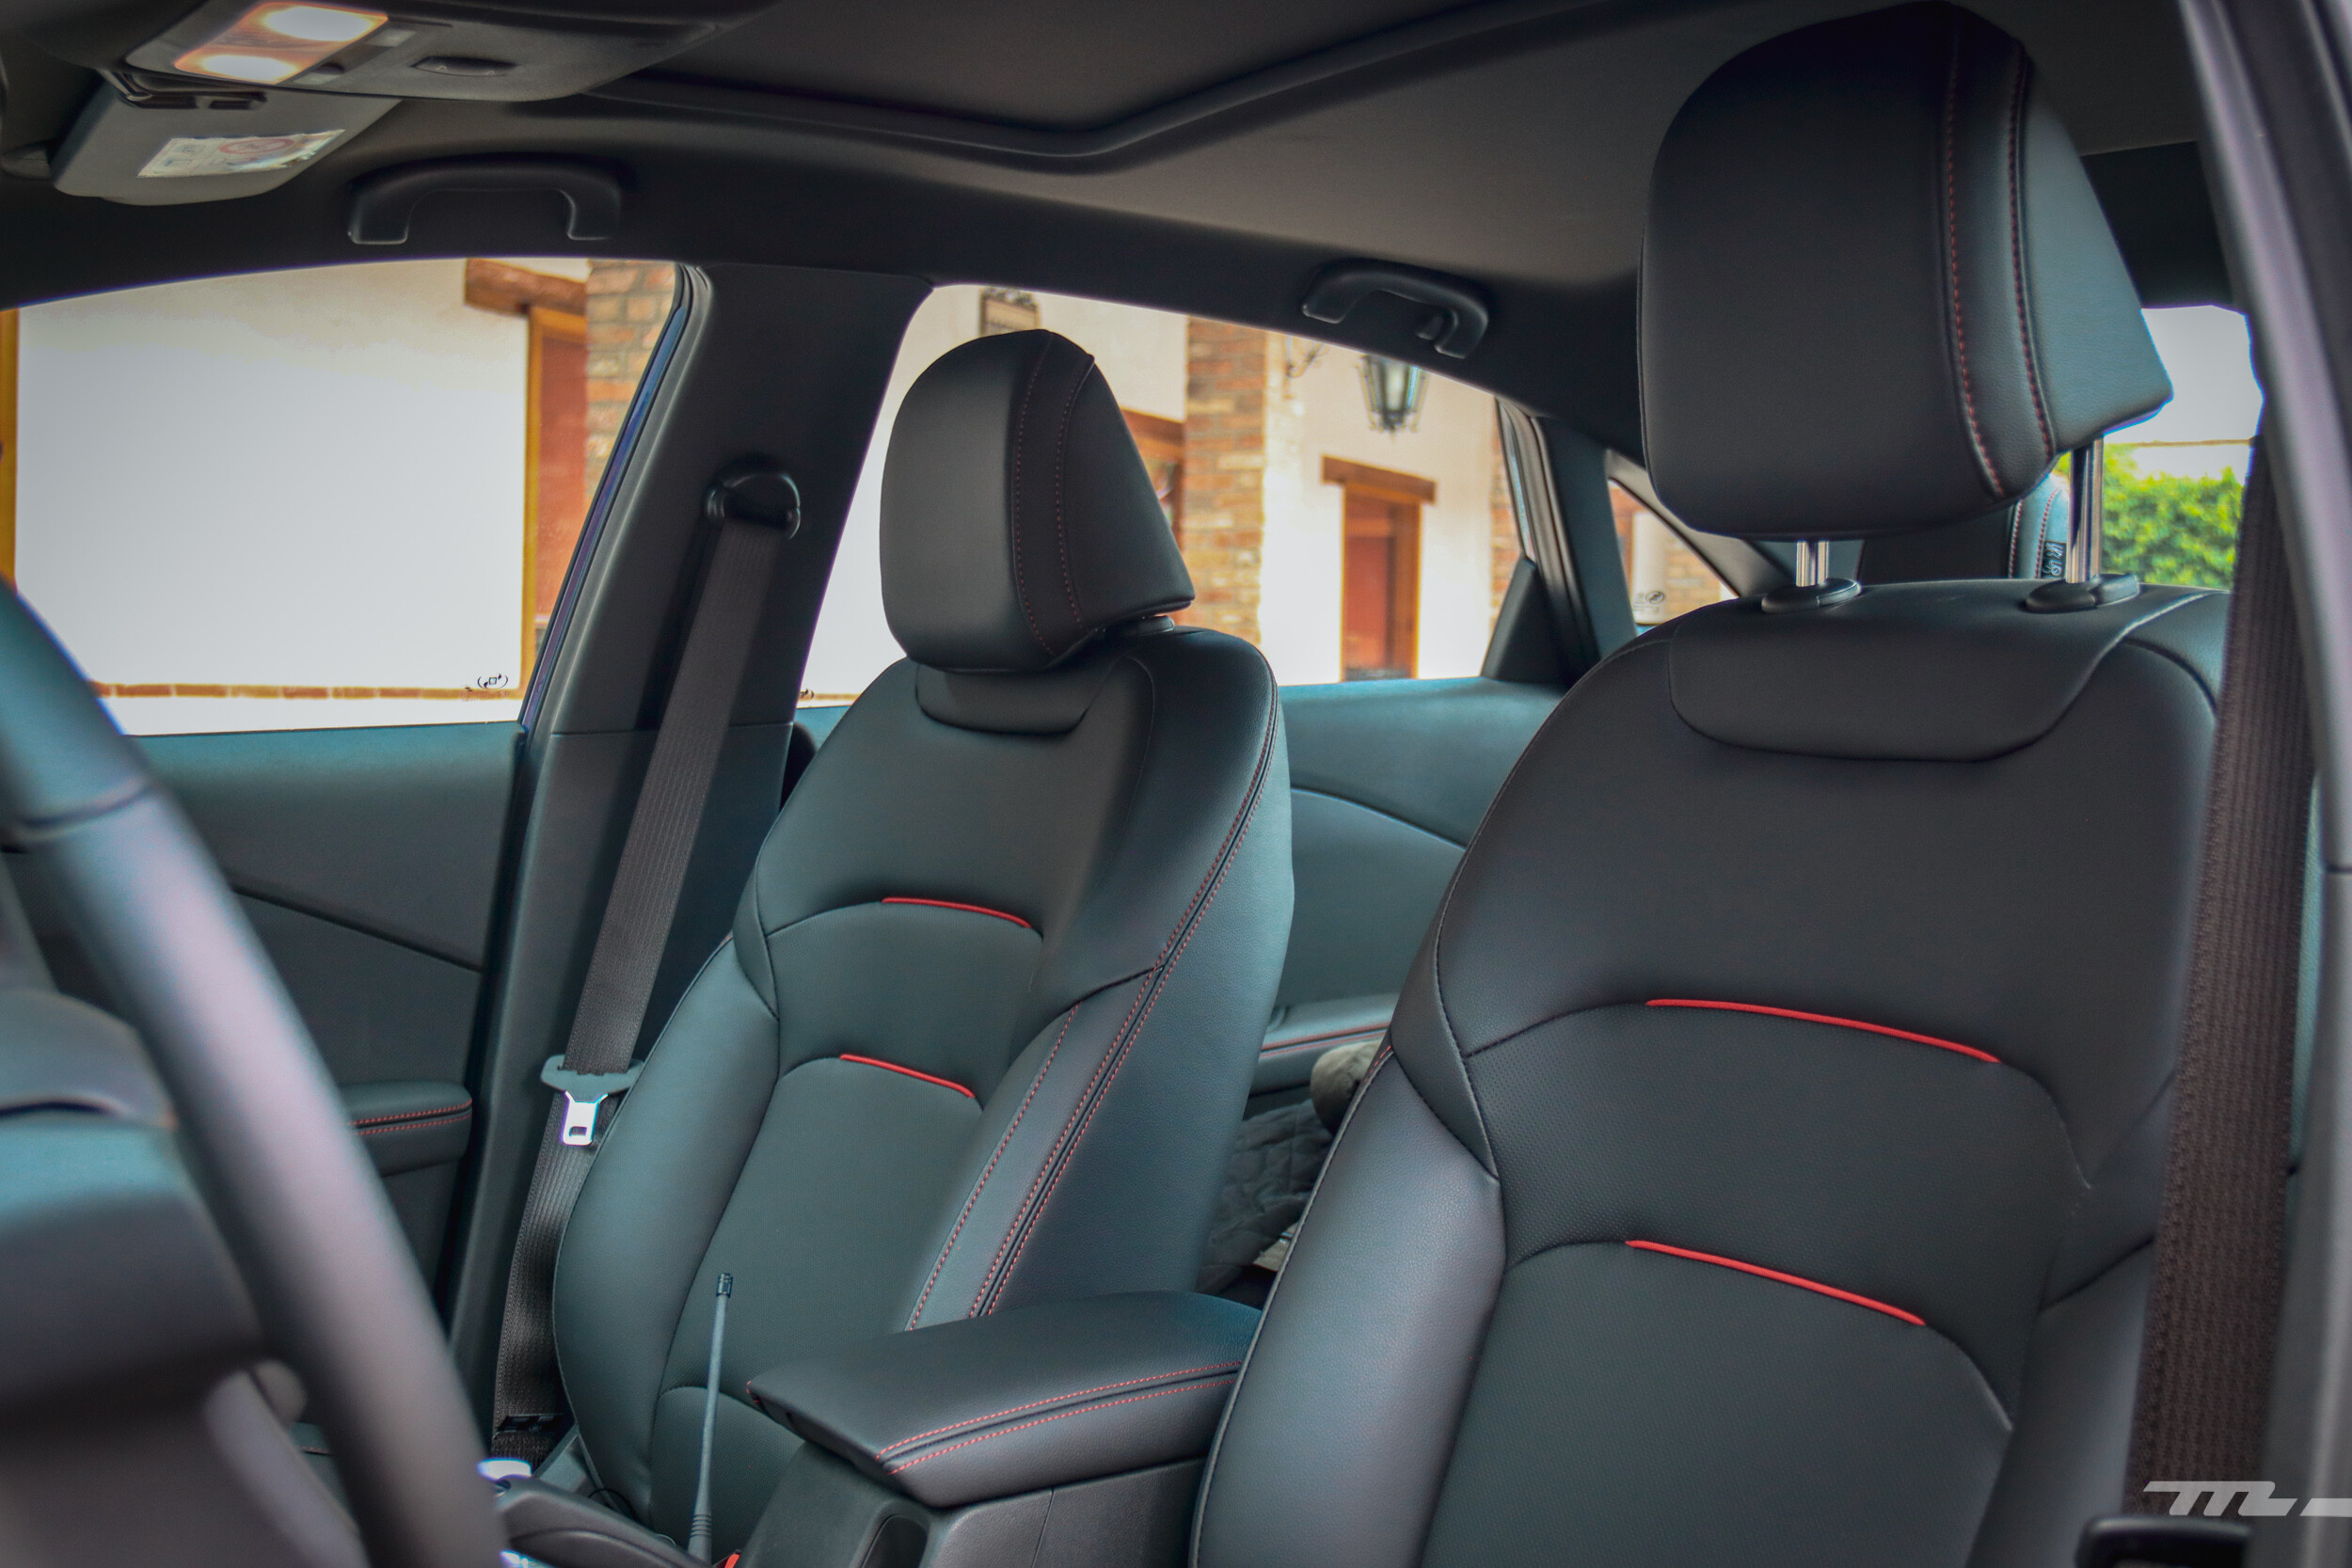 Foto de Chevrolet Cavalier Turbo 2022: Primer vistazo (32/37)